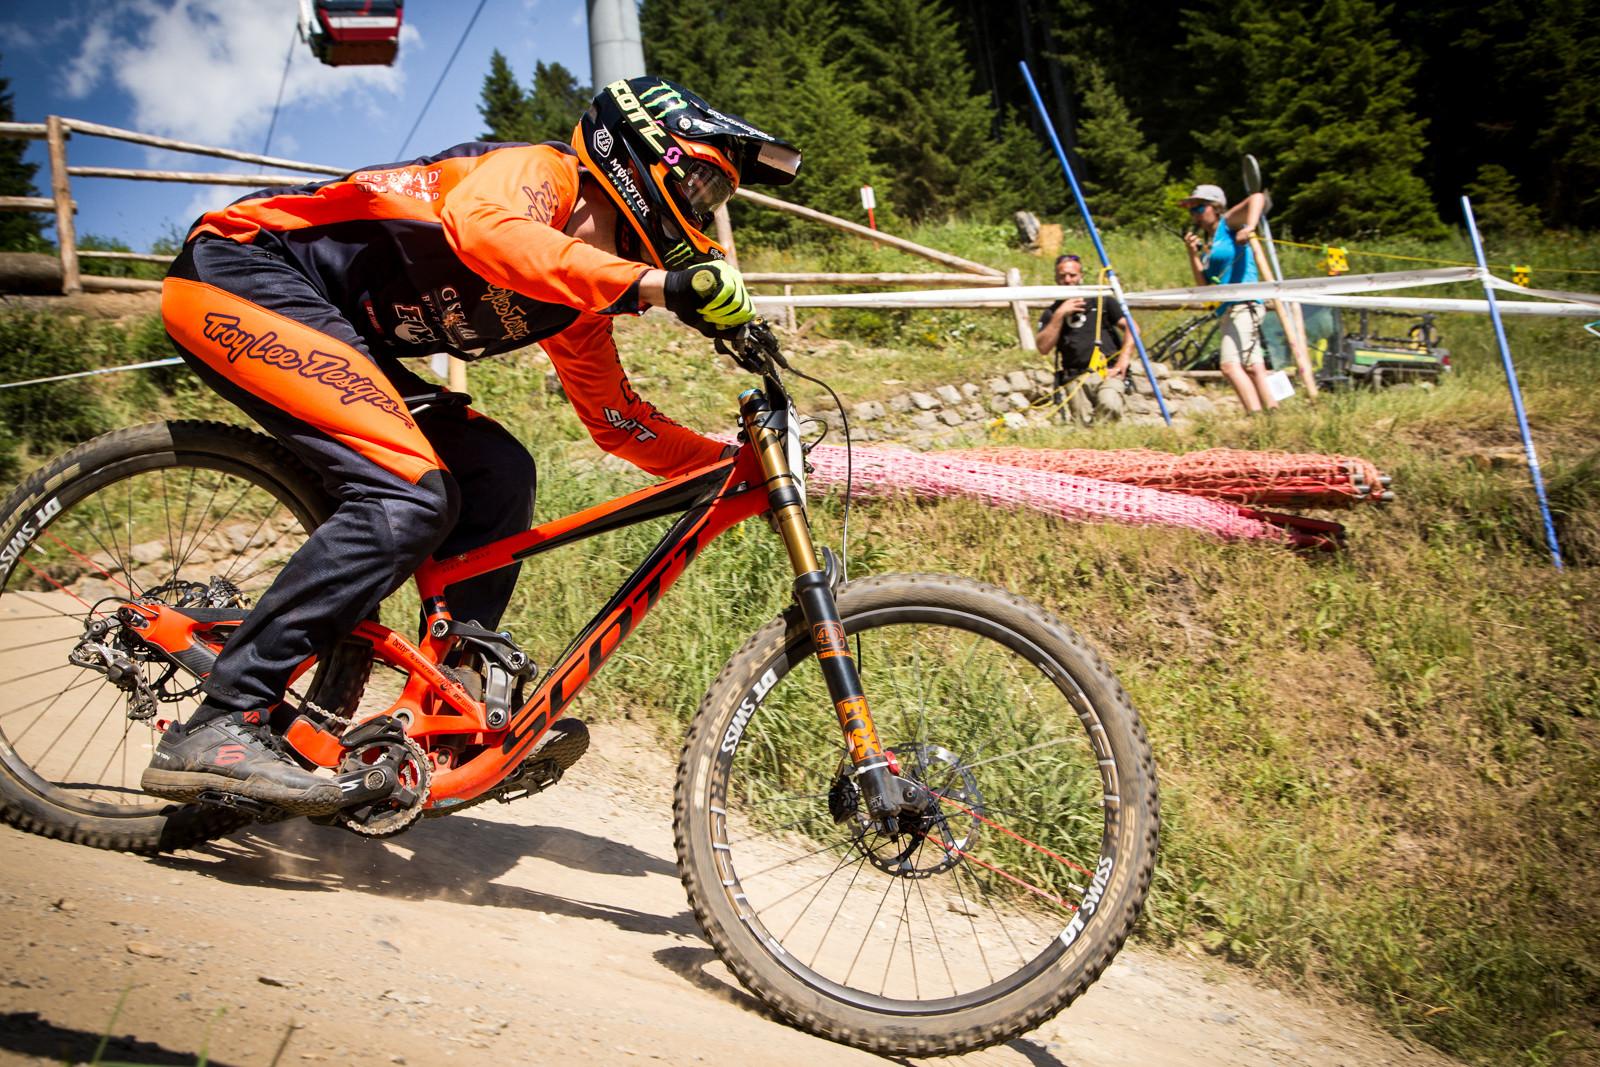 Brendan Fairclough, G-Out Project, Lenzerheide World Cup - G-Out Project - Lenzerheide World Cup - Mountain Biking Pictures - Vital MTB